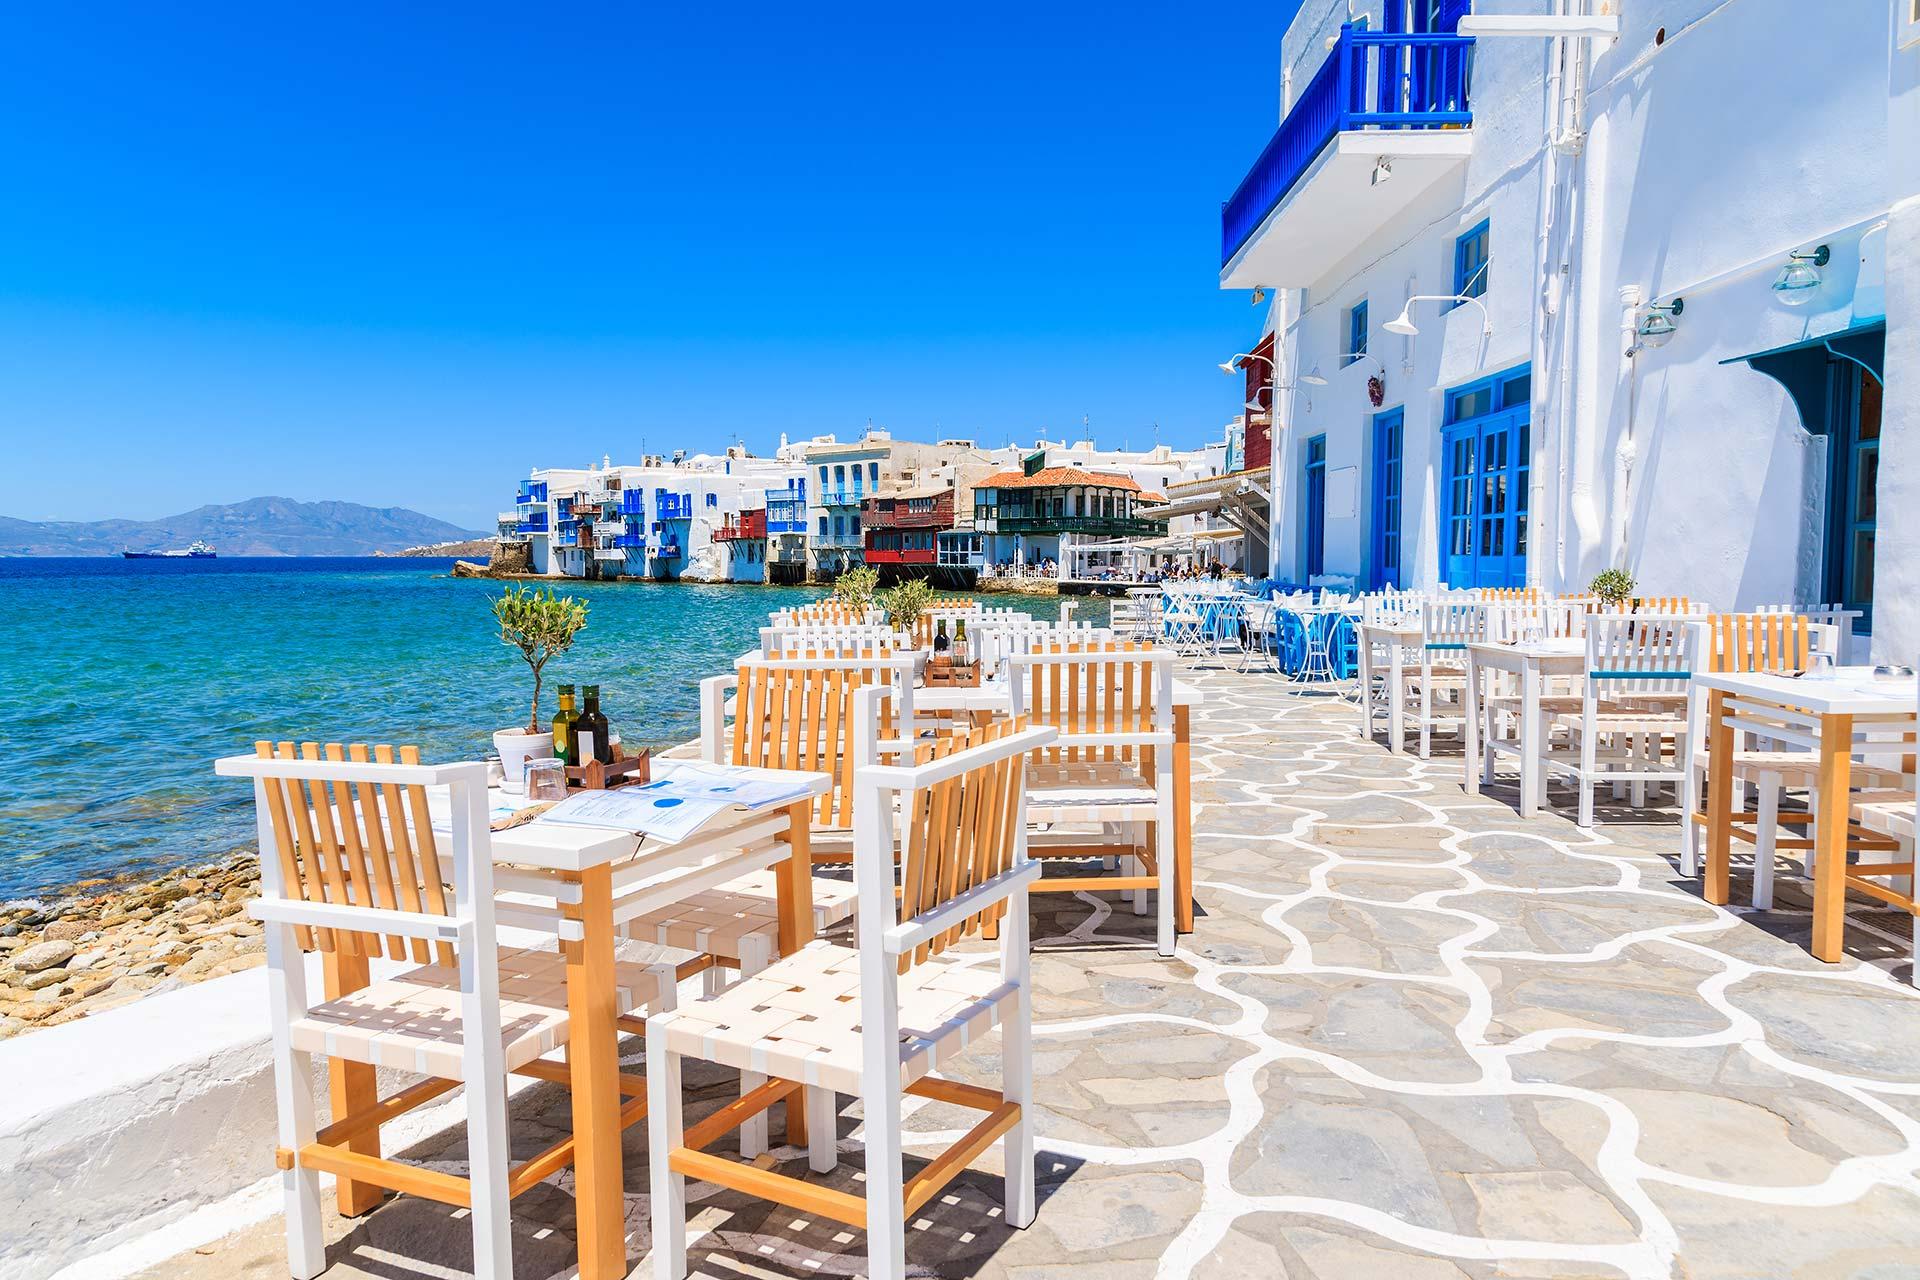 Grécia - Miriam Accaoiu